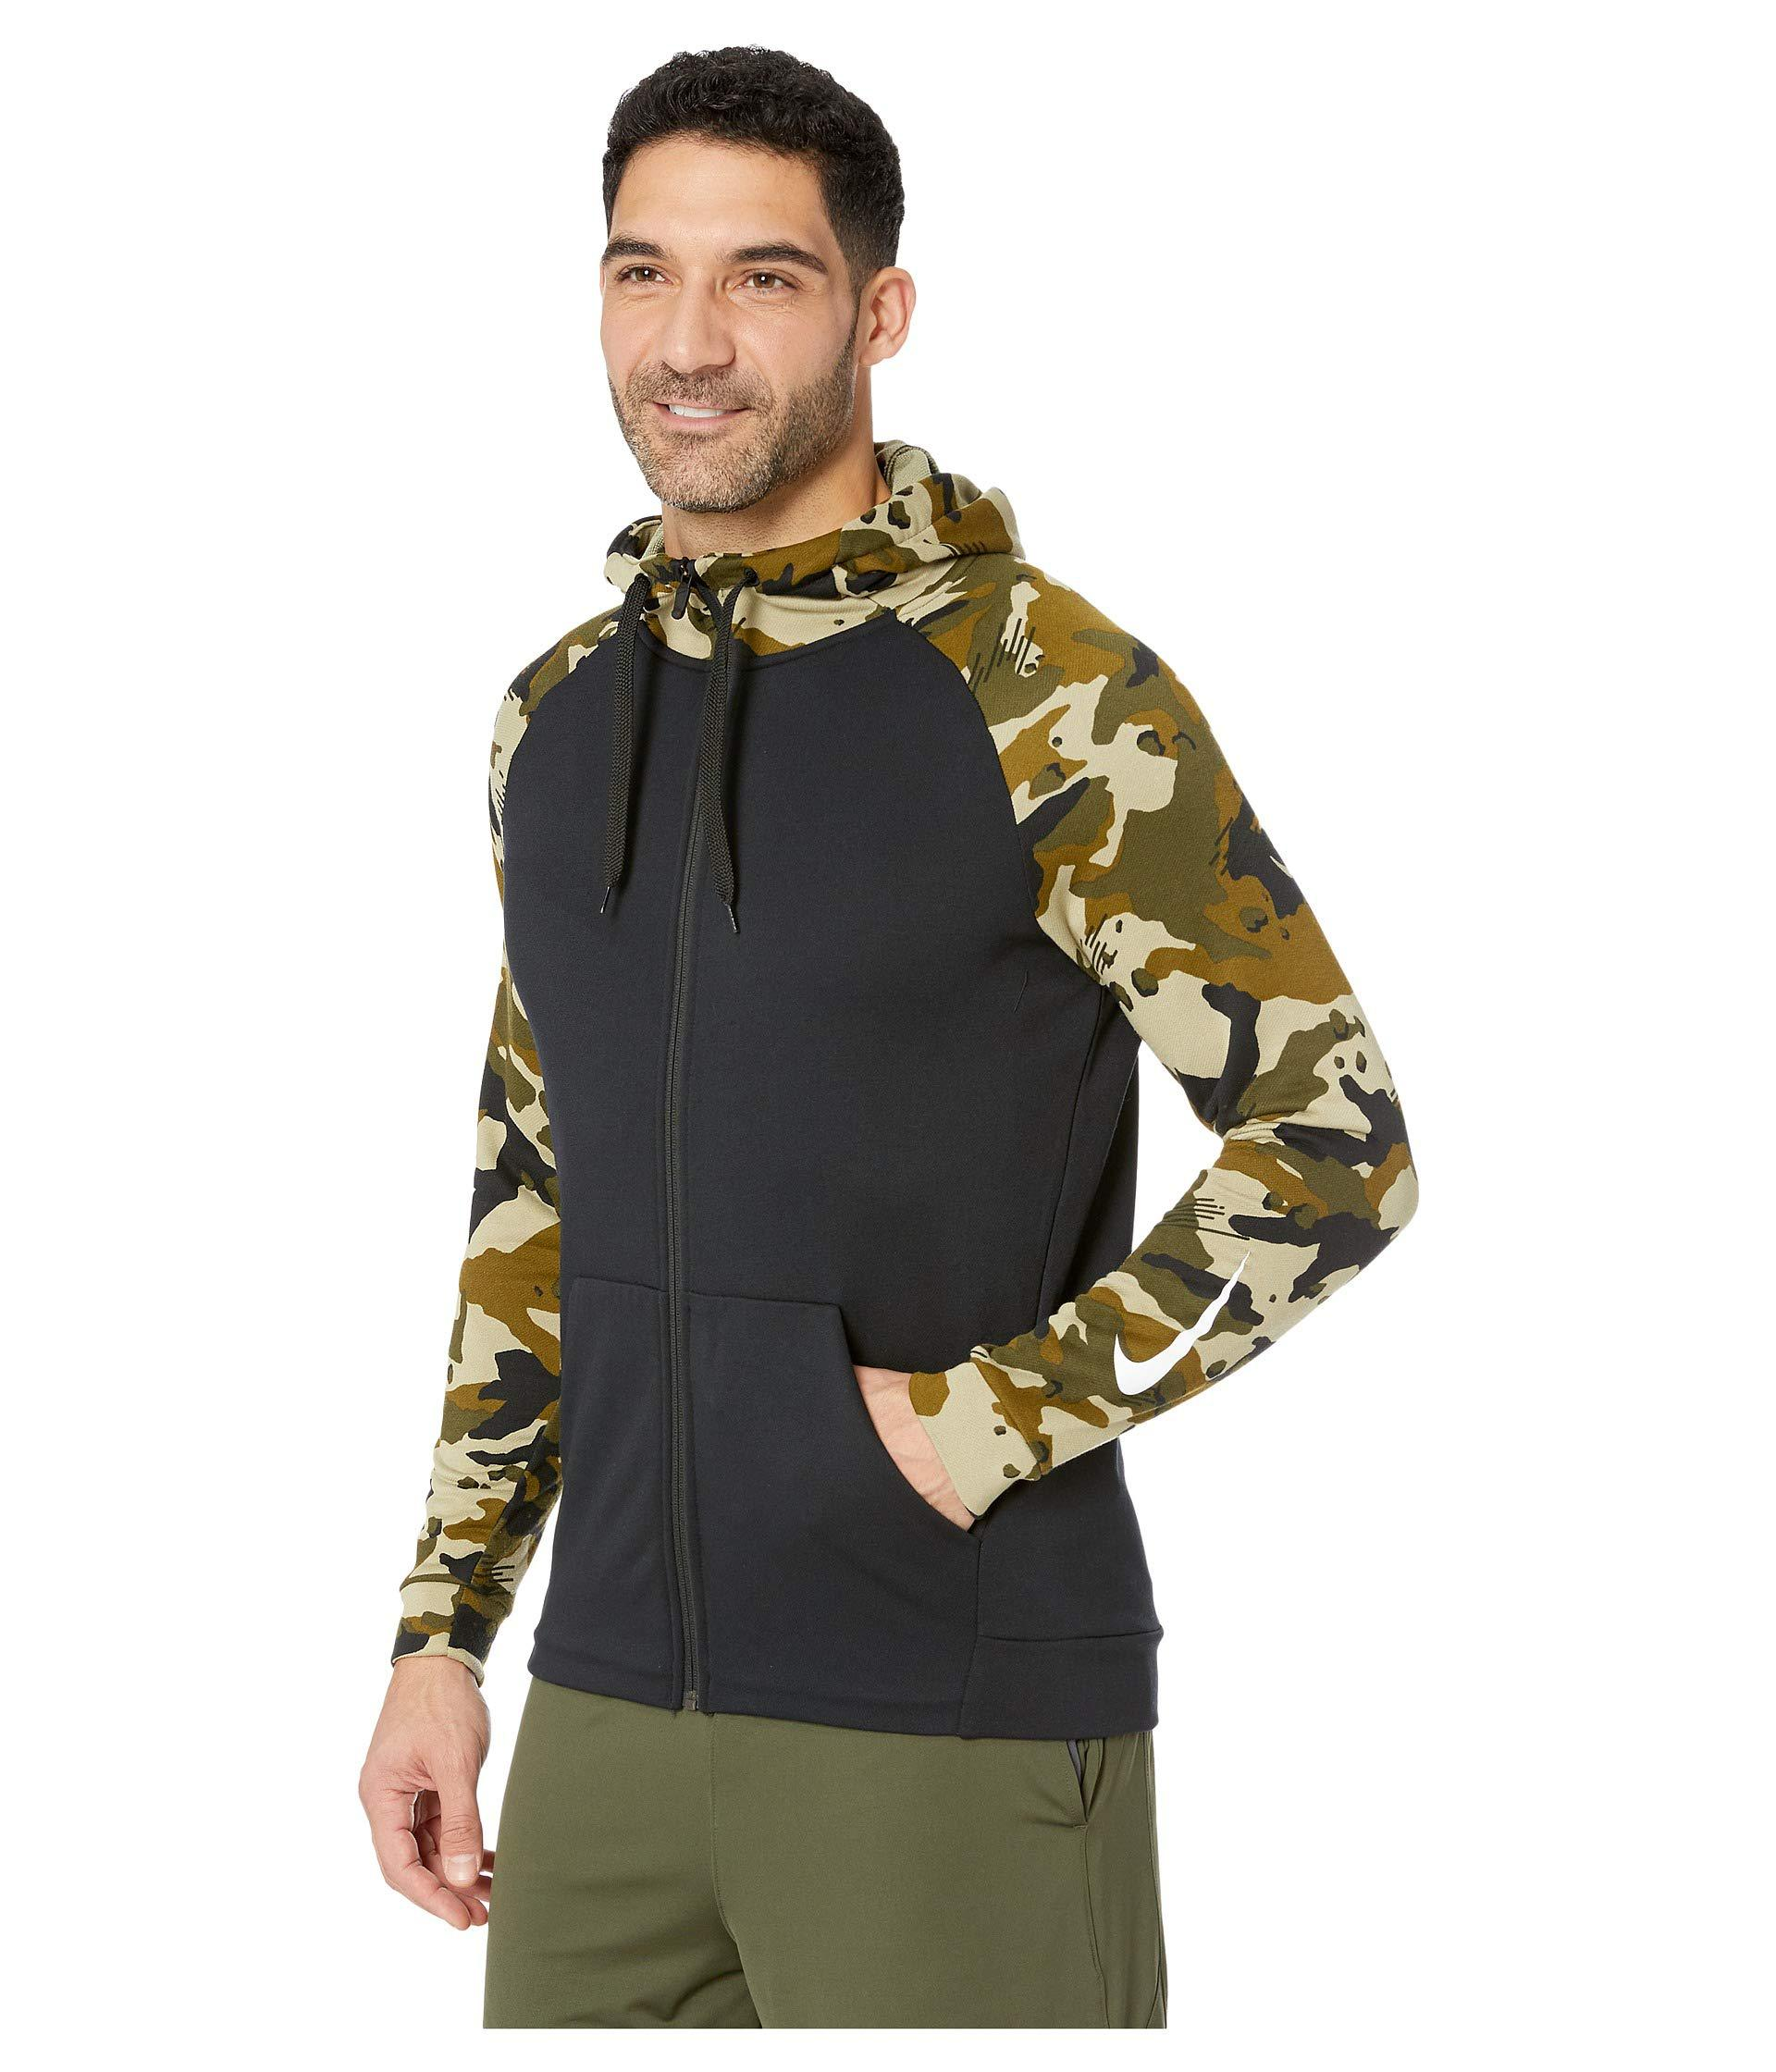 67f8ac39e30 Lyst - Nike Dry Hoodie Full Zip Fleece 2l Camo in Black for Men - Save 19%